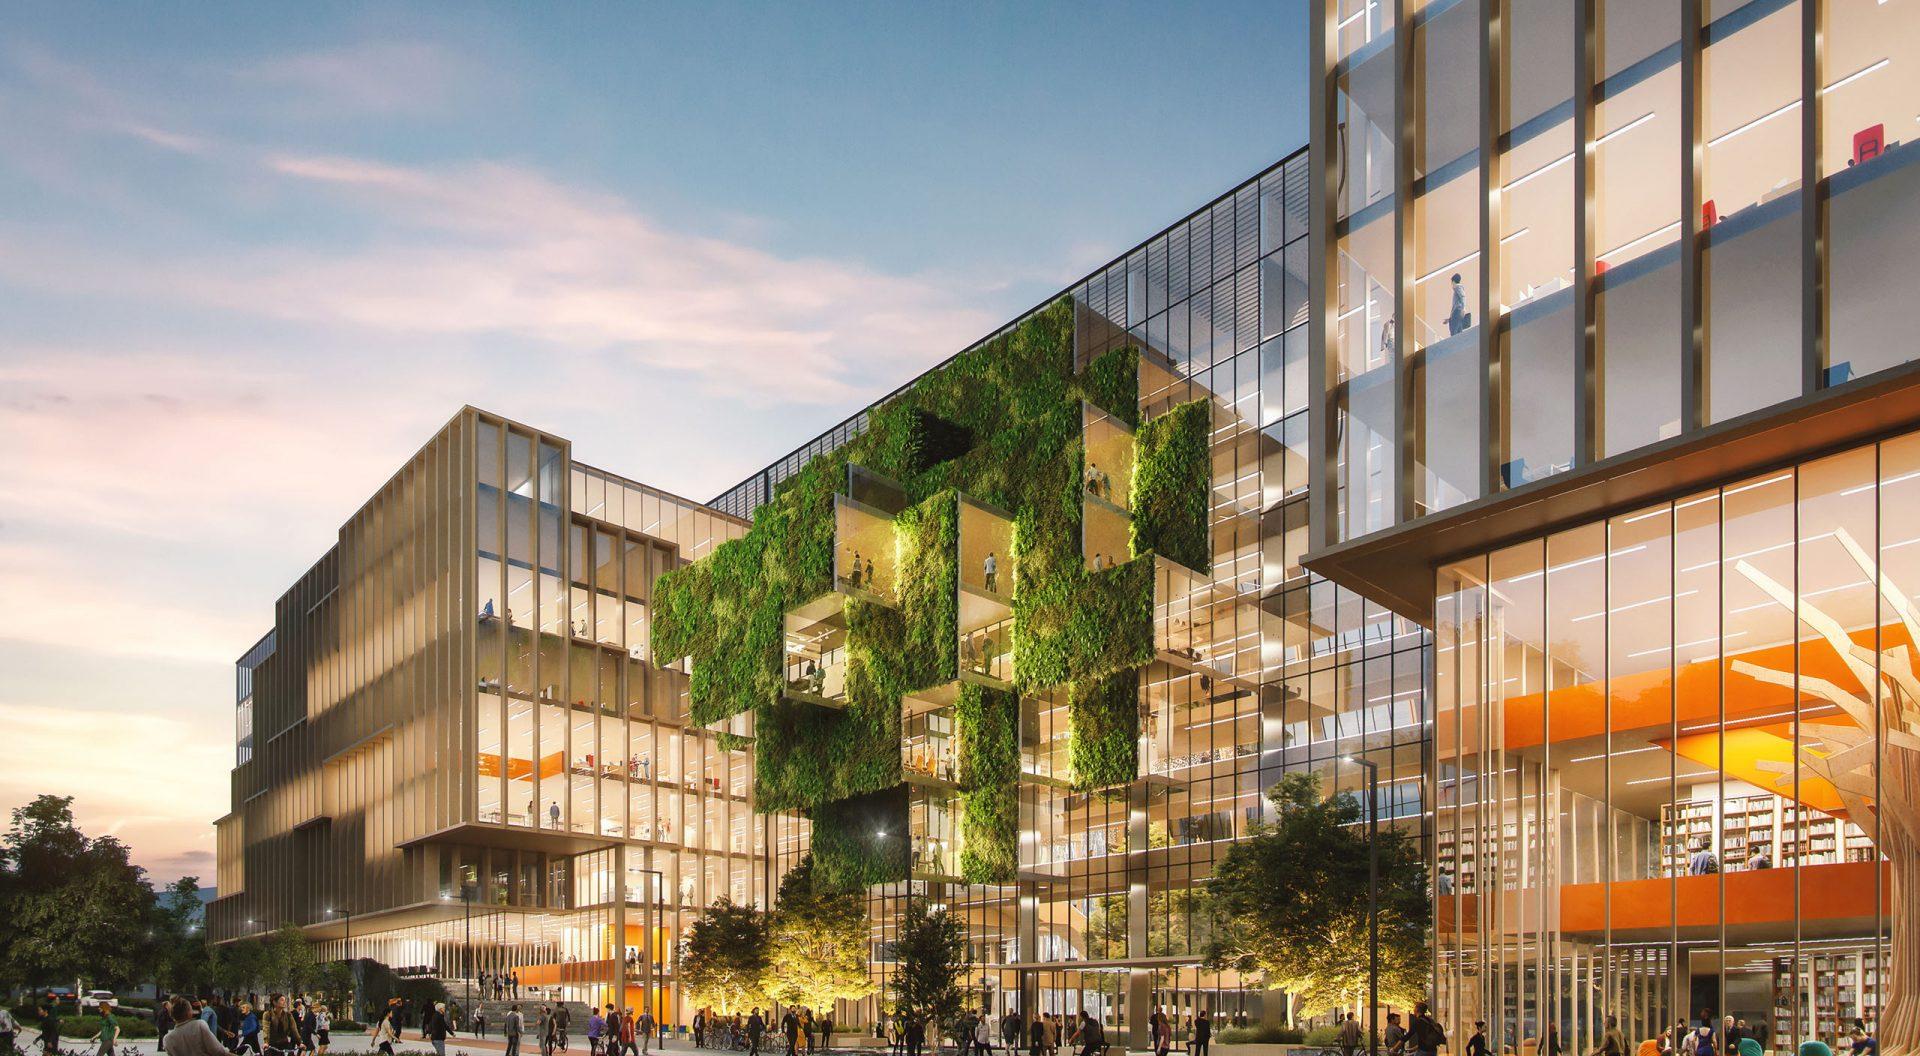 Vi har tatt en prat med Rolf Maurseth, markedssjef og sivilarkitekt i LINK Arkitektur AS